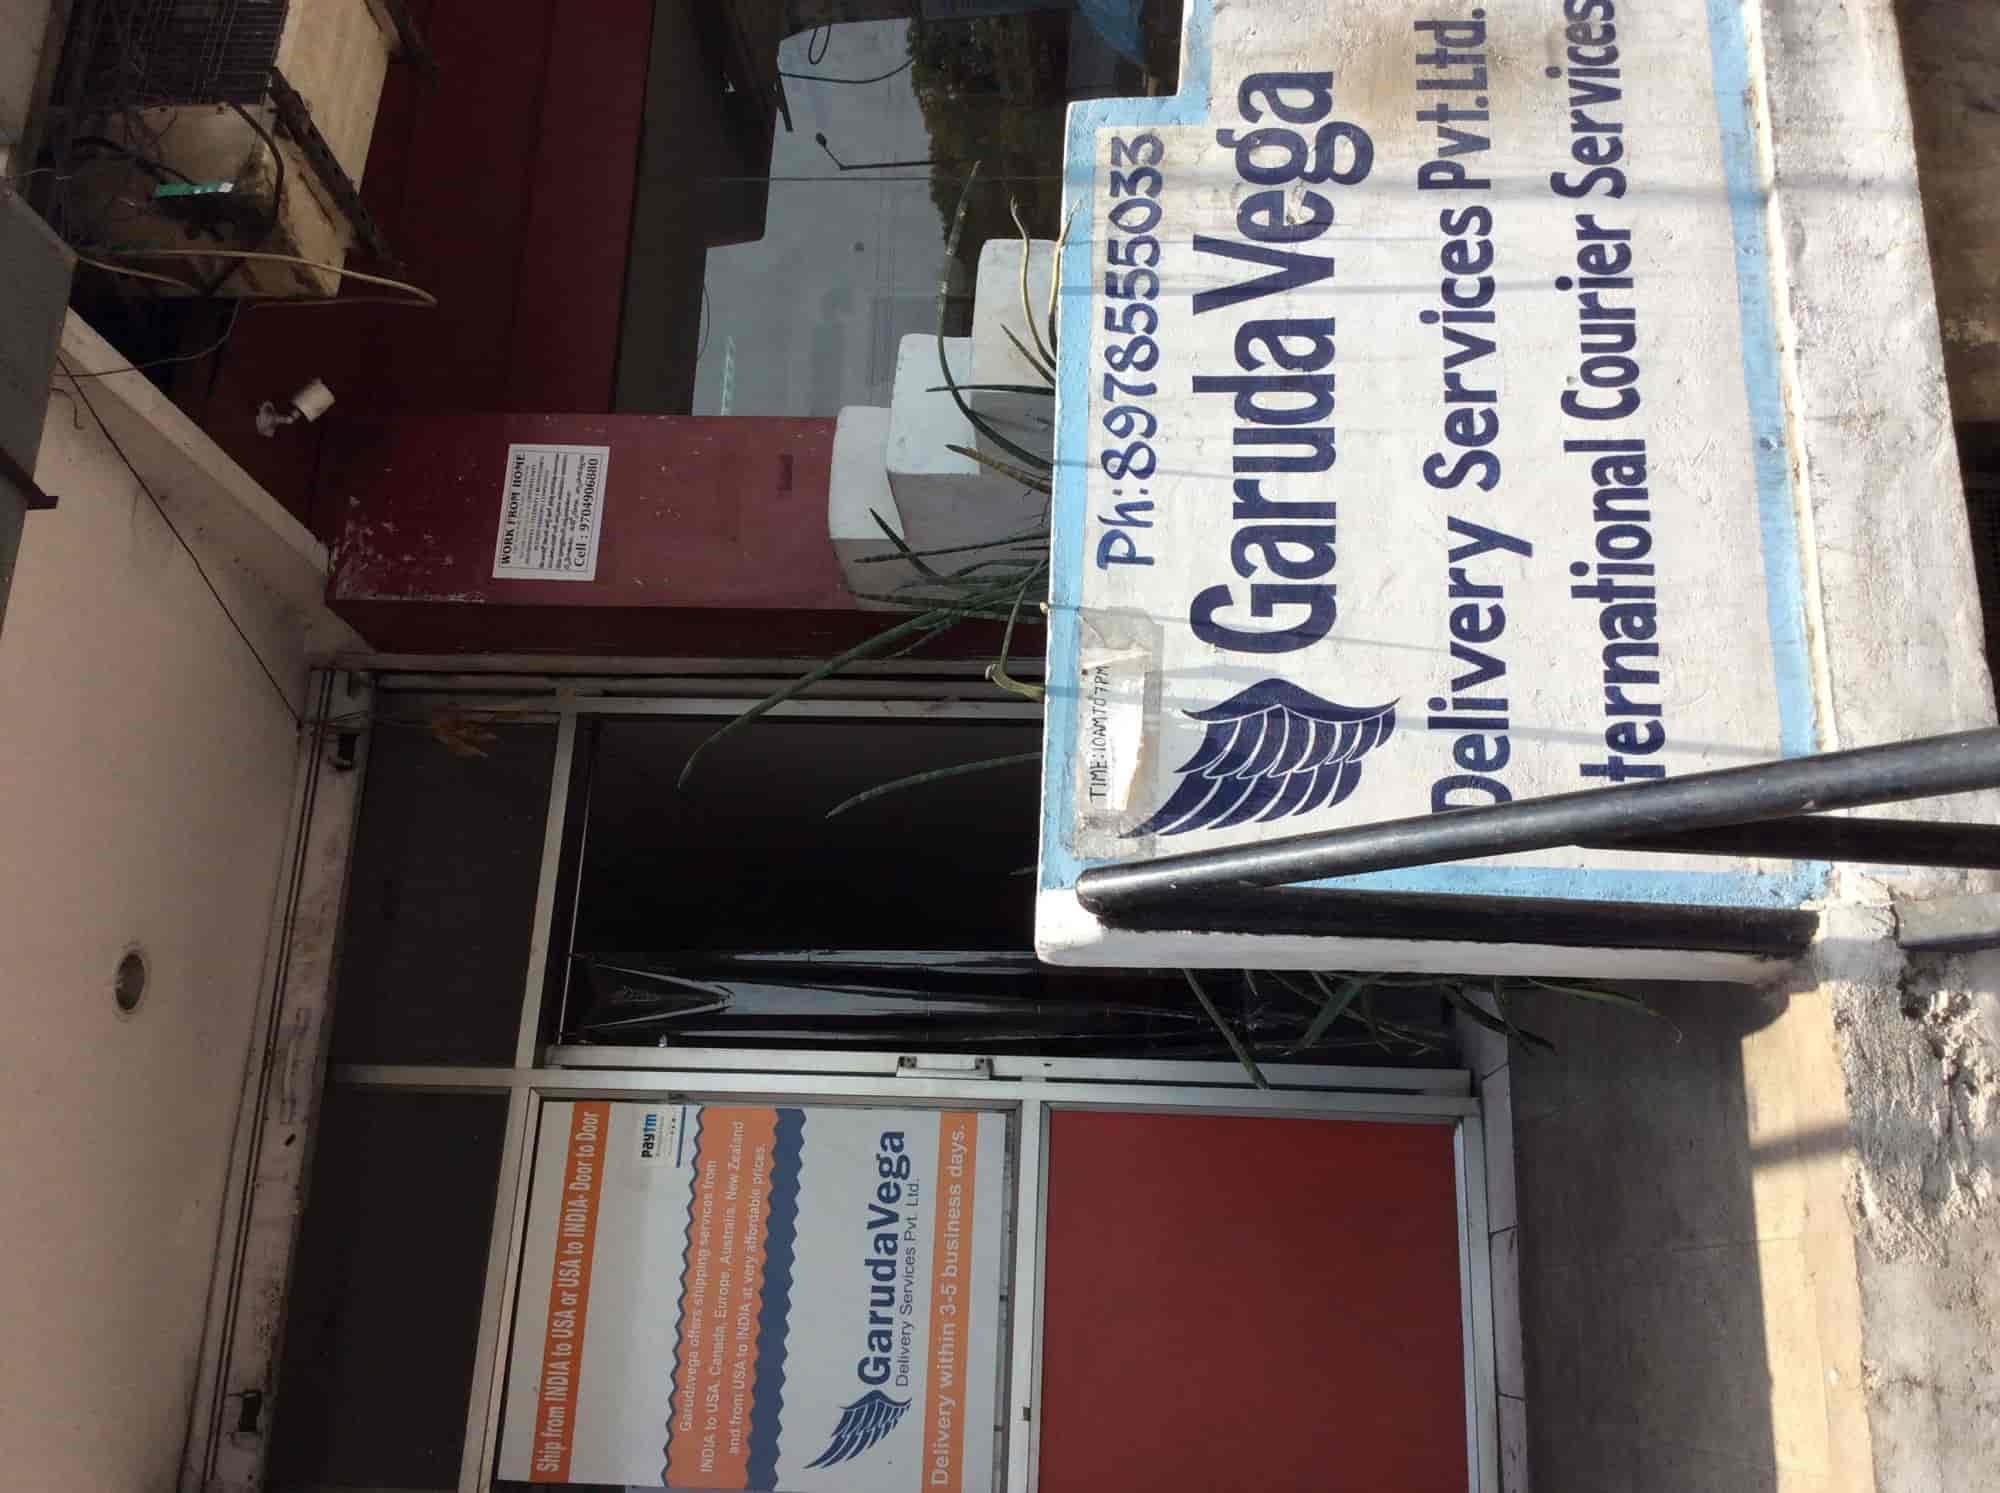 Garudavega Delivery Services Pvt Ltd, Tarnaka